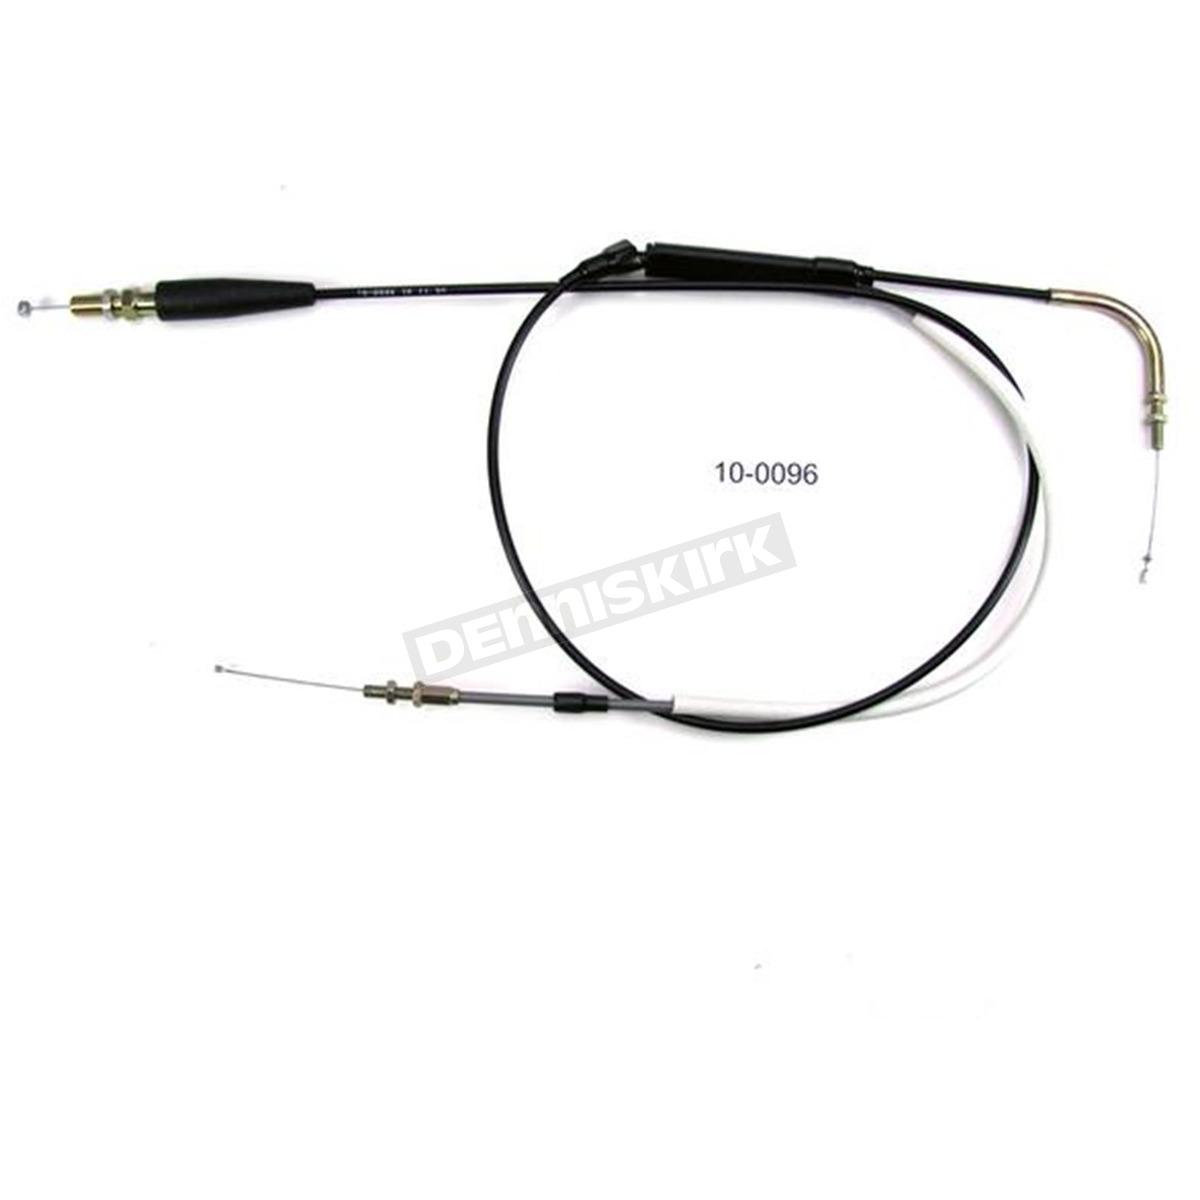 Motion Pro Throttle Cable